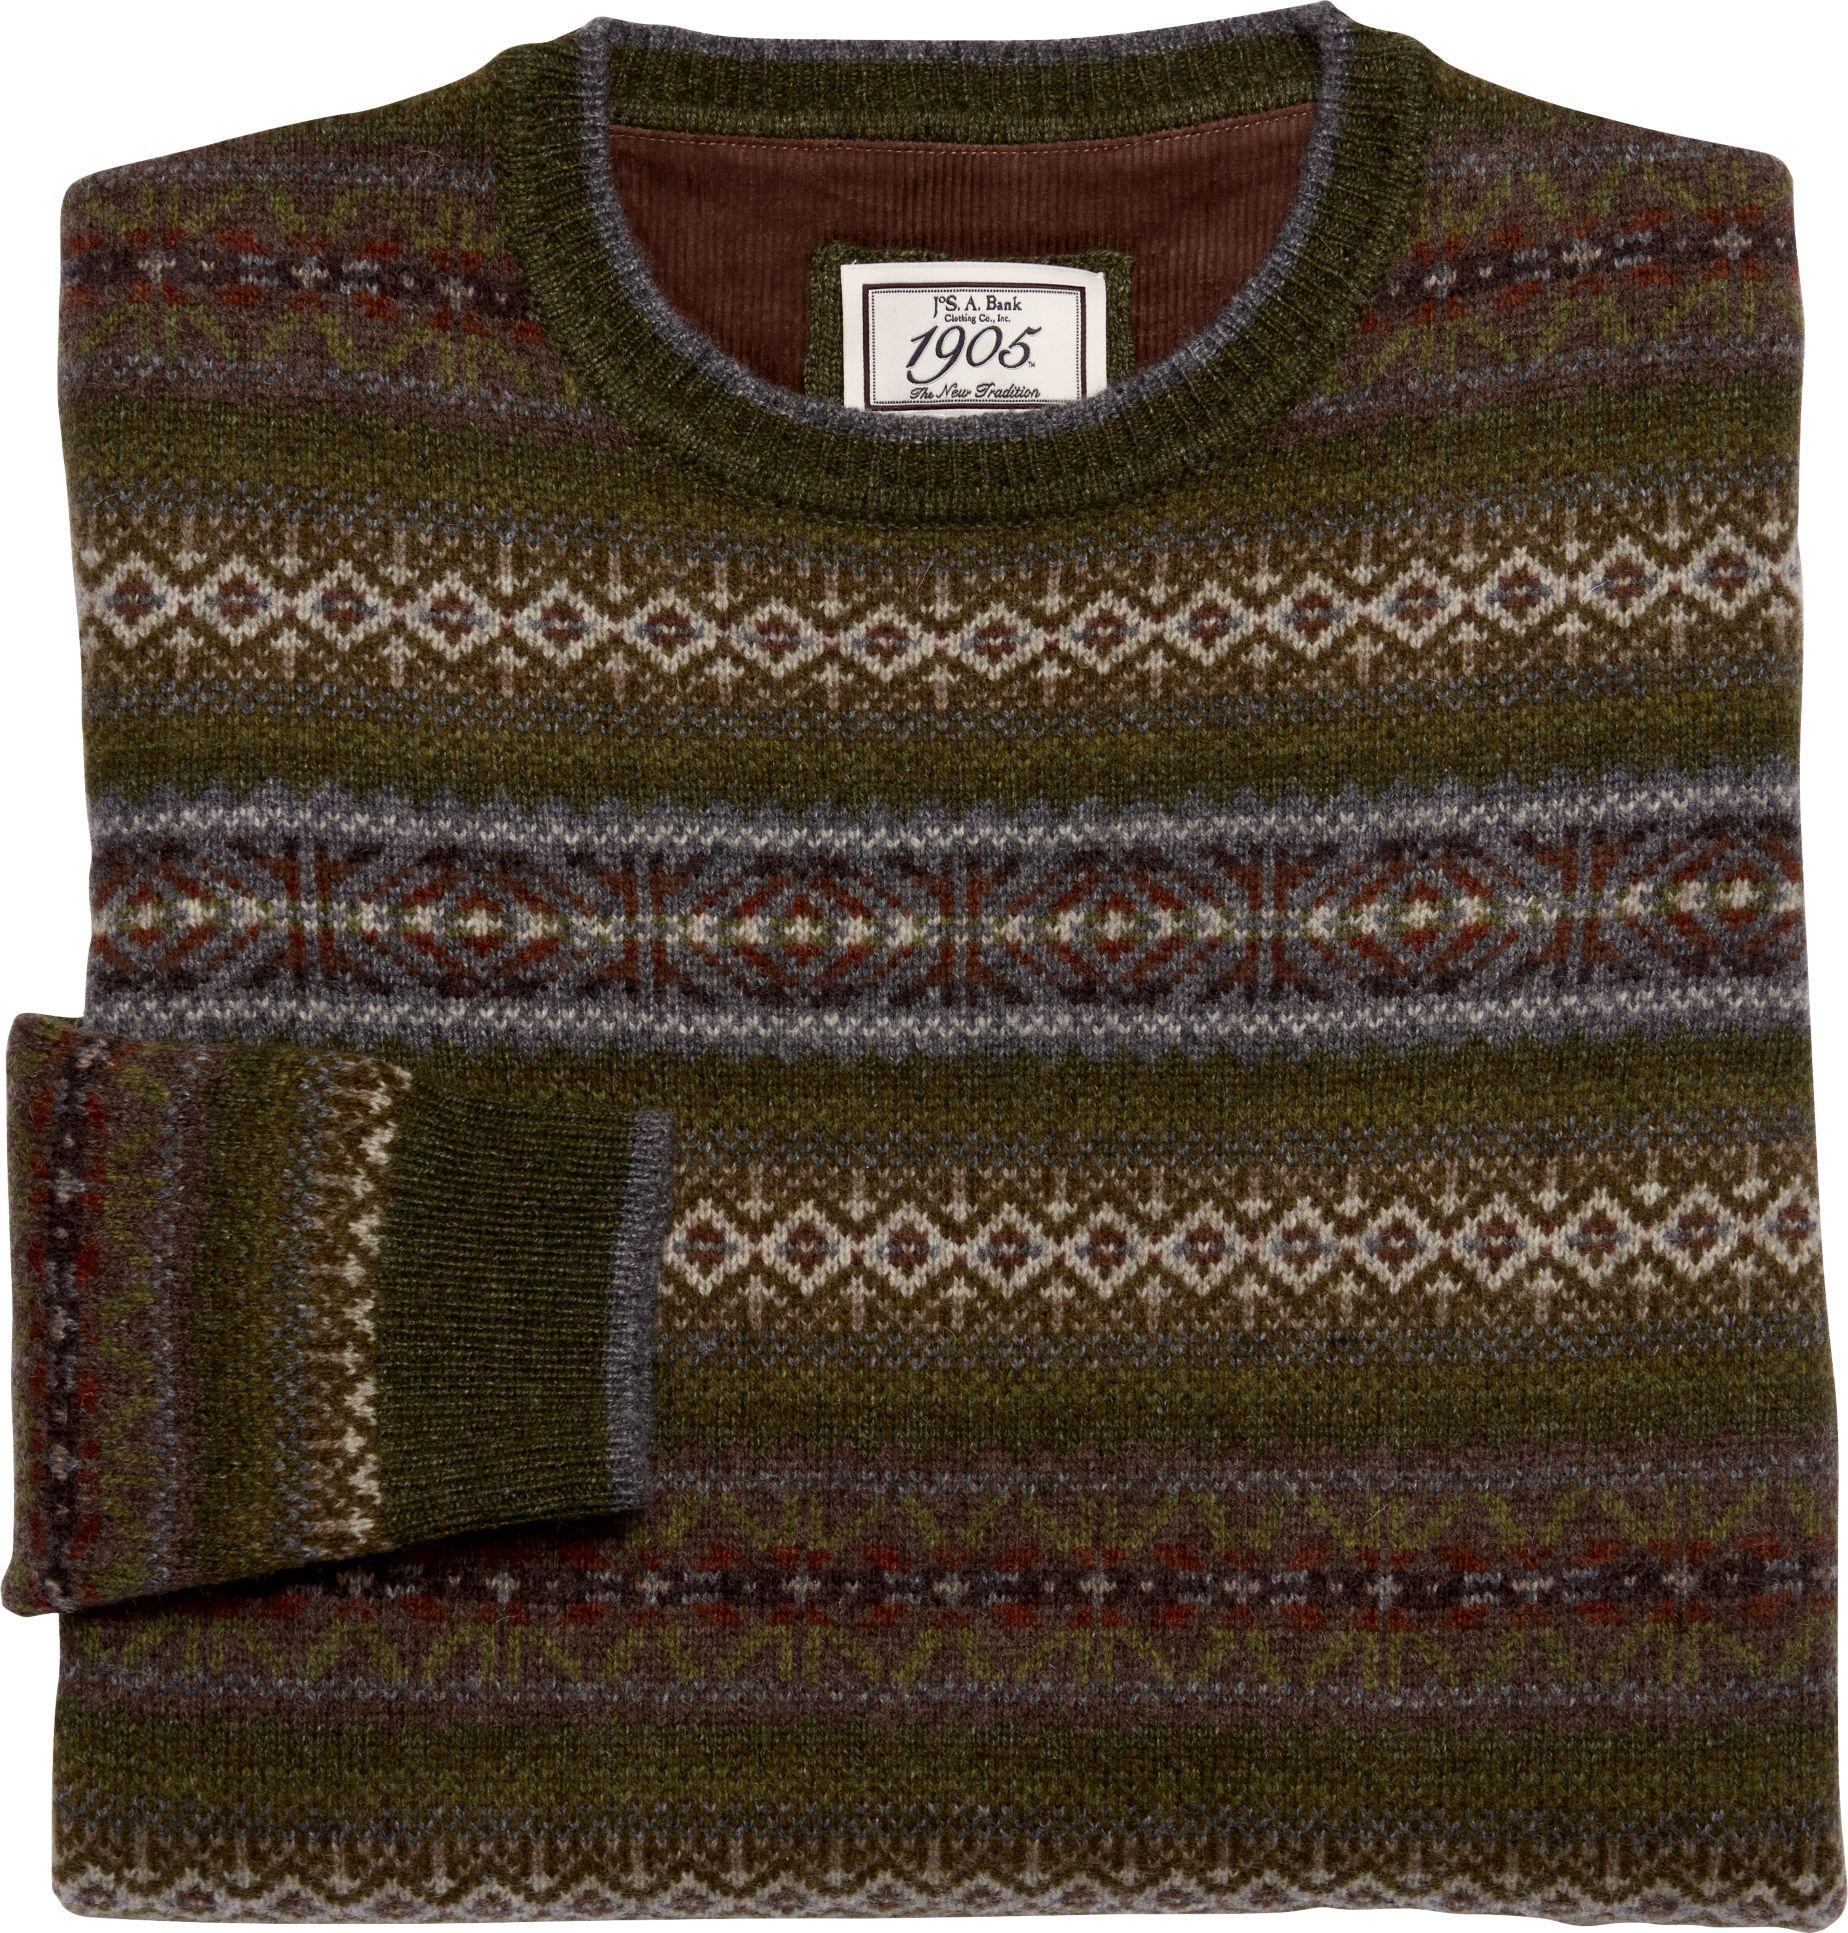 1905 Fair Isle Sweater - Big & Tall CLEARANCE - All Clearance ...